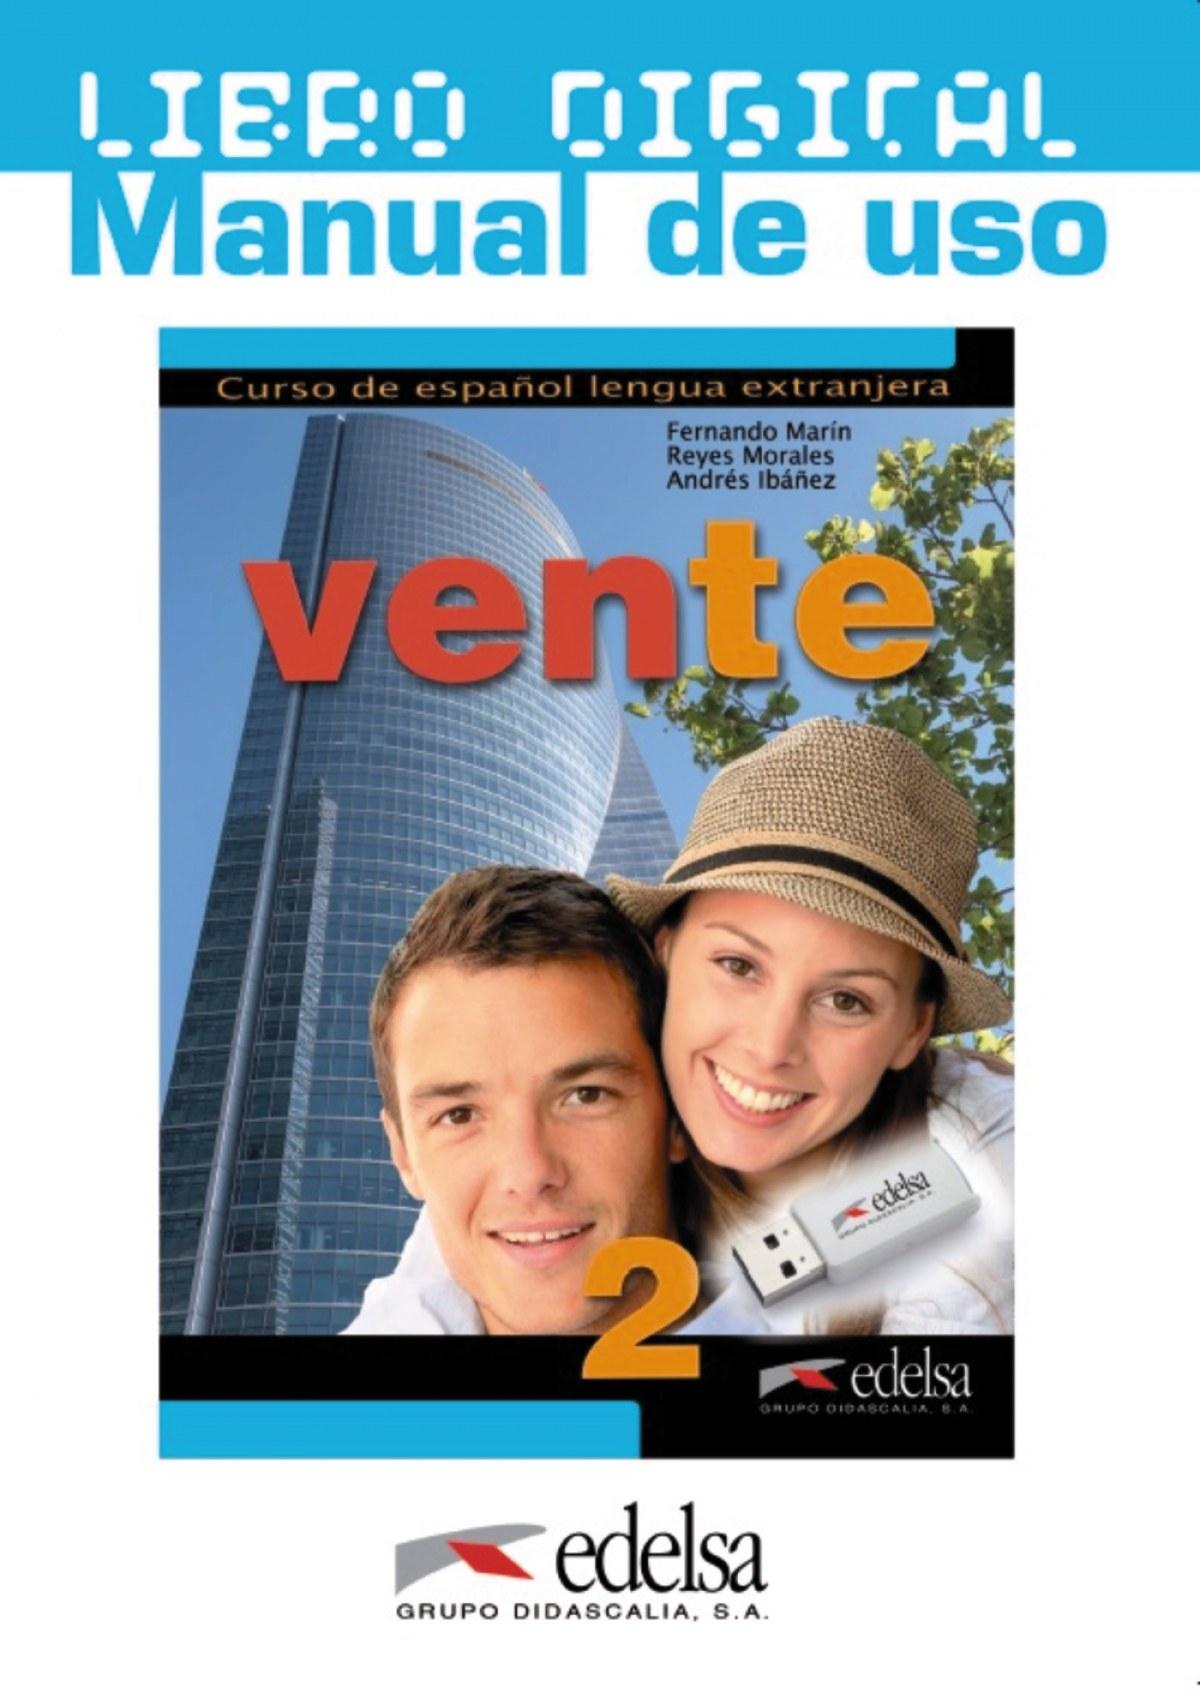 Vente 2 (B1+) - libro digital + manual de uso profesor